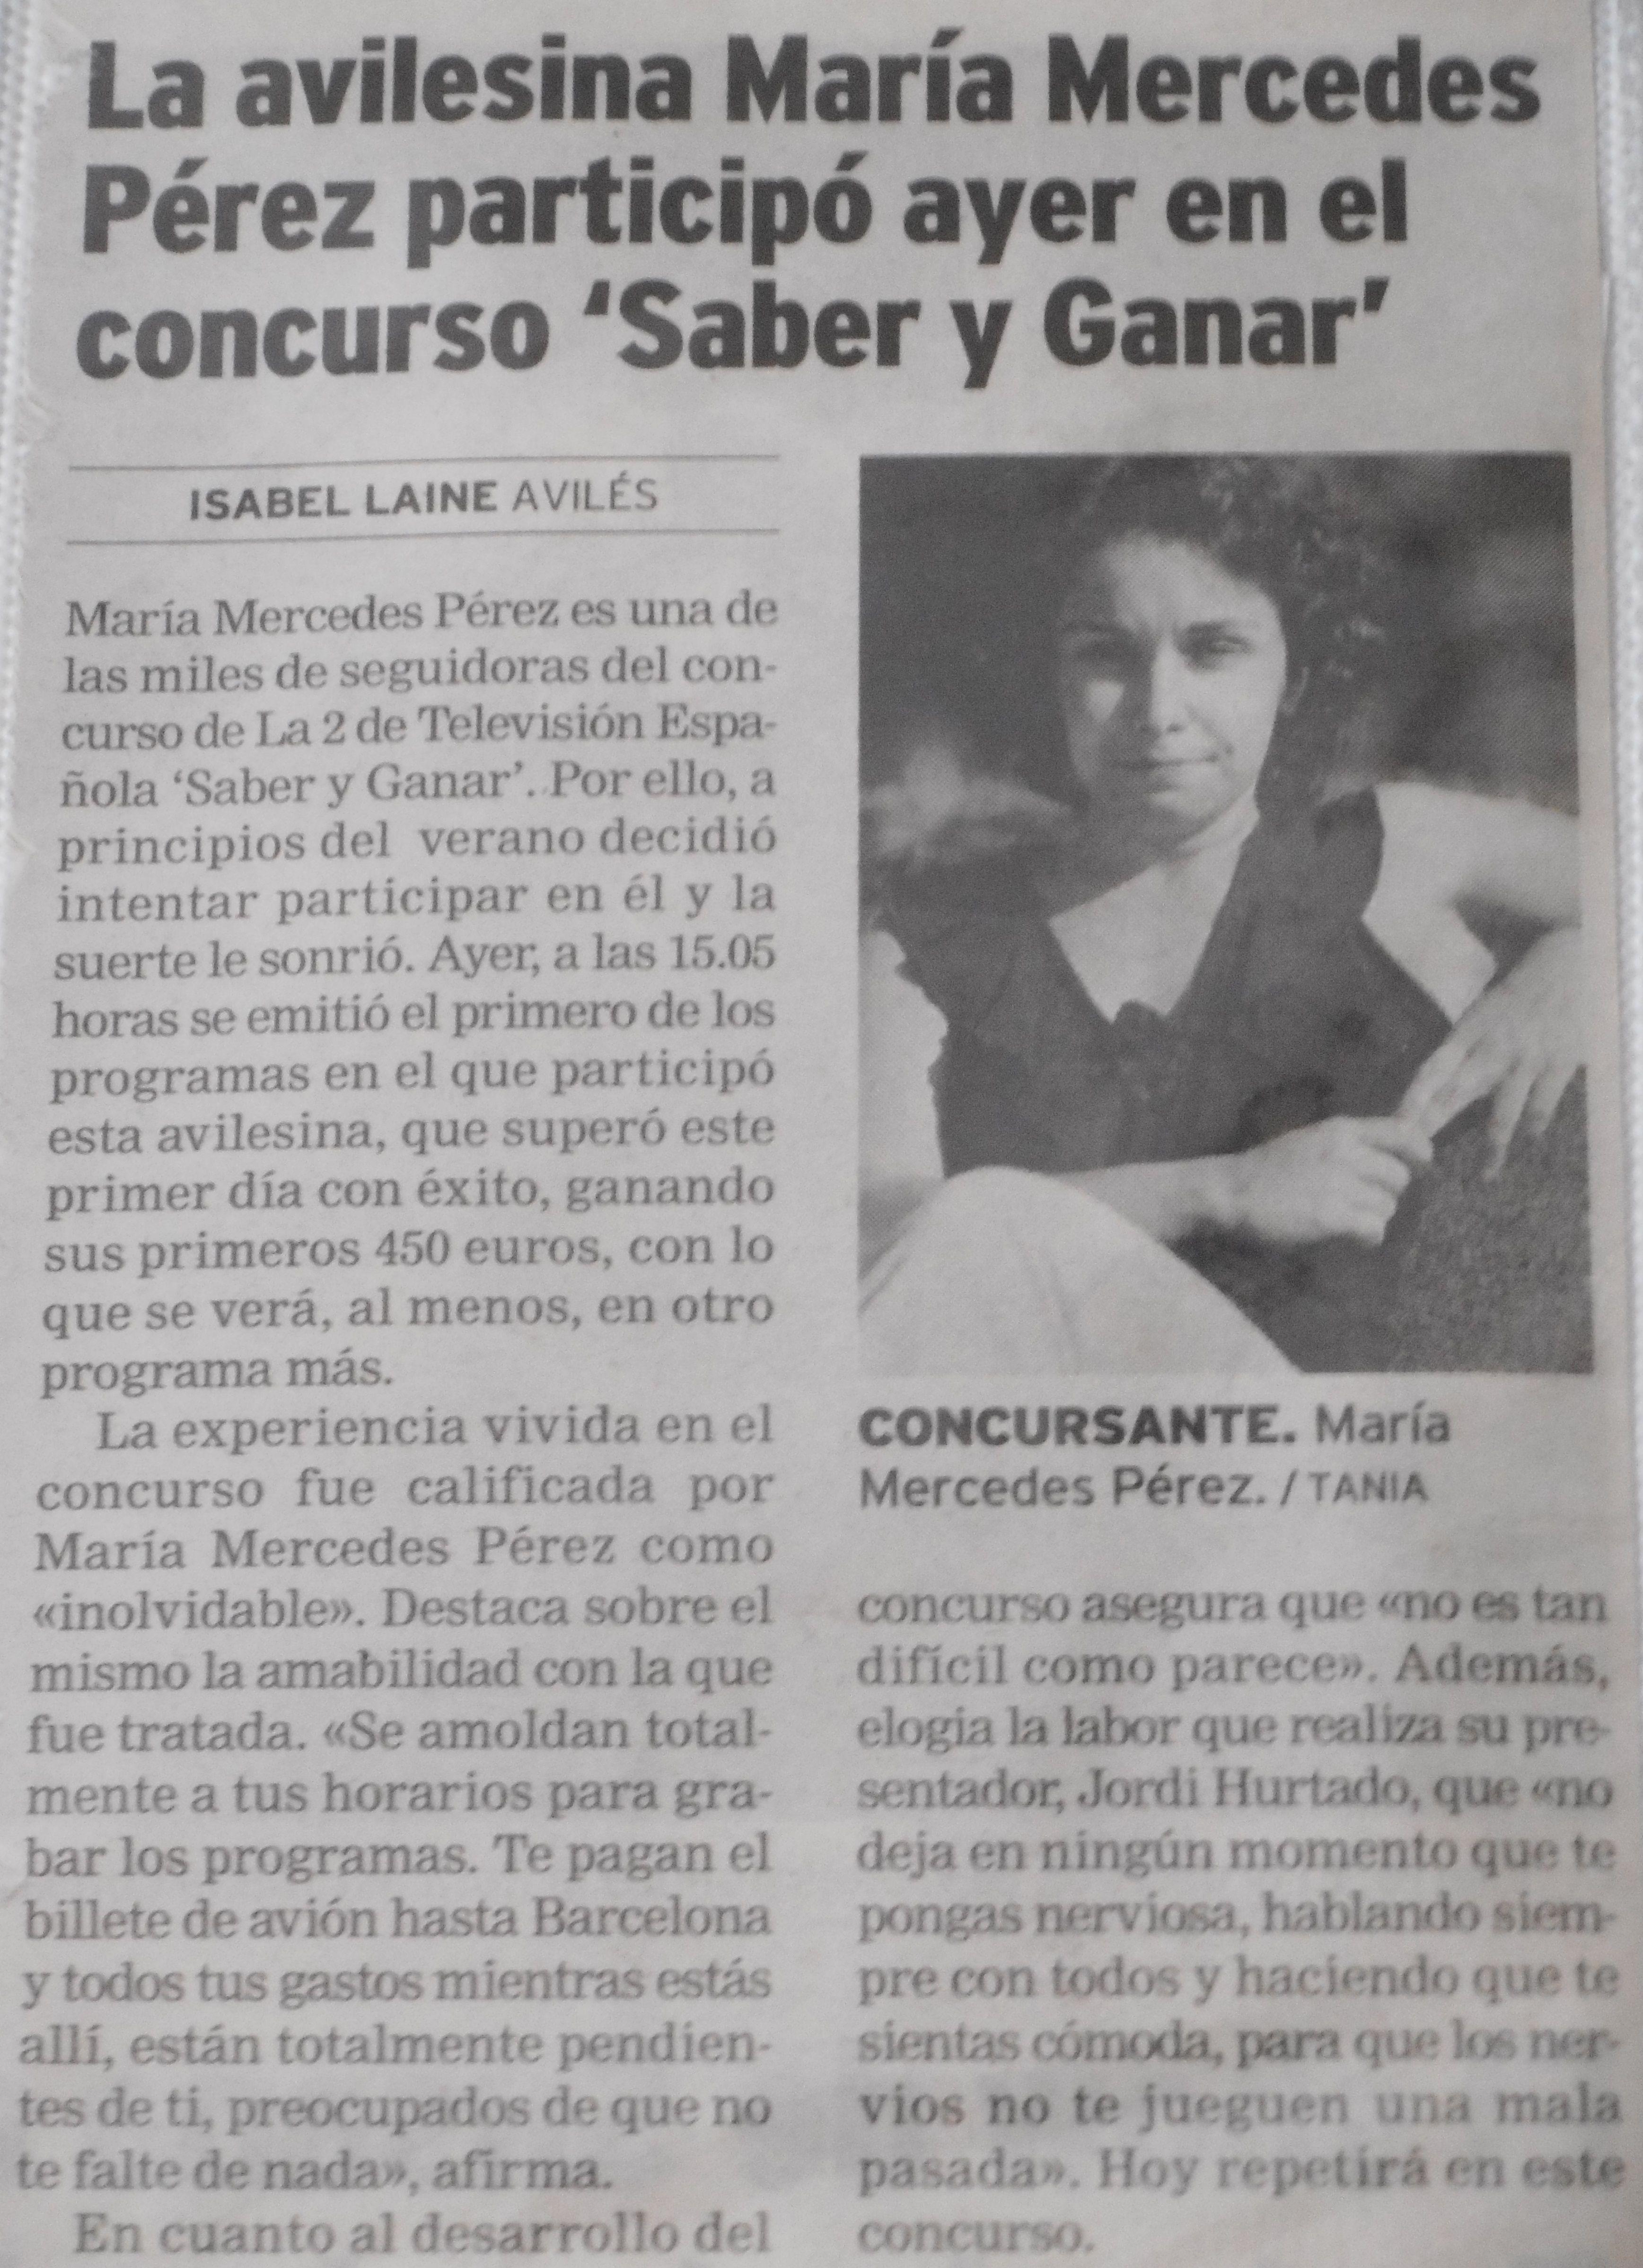 Maria Mercedes Perez Casado En La Voz De Aviles Jul 2005 La Voz Mercedes Fotos De Perfil